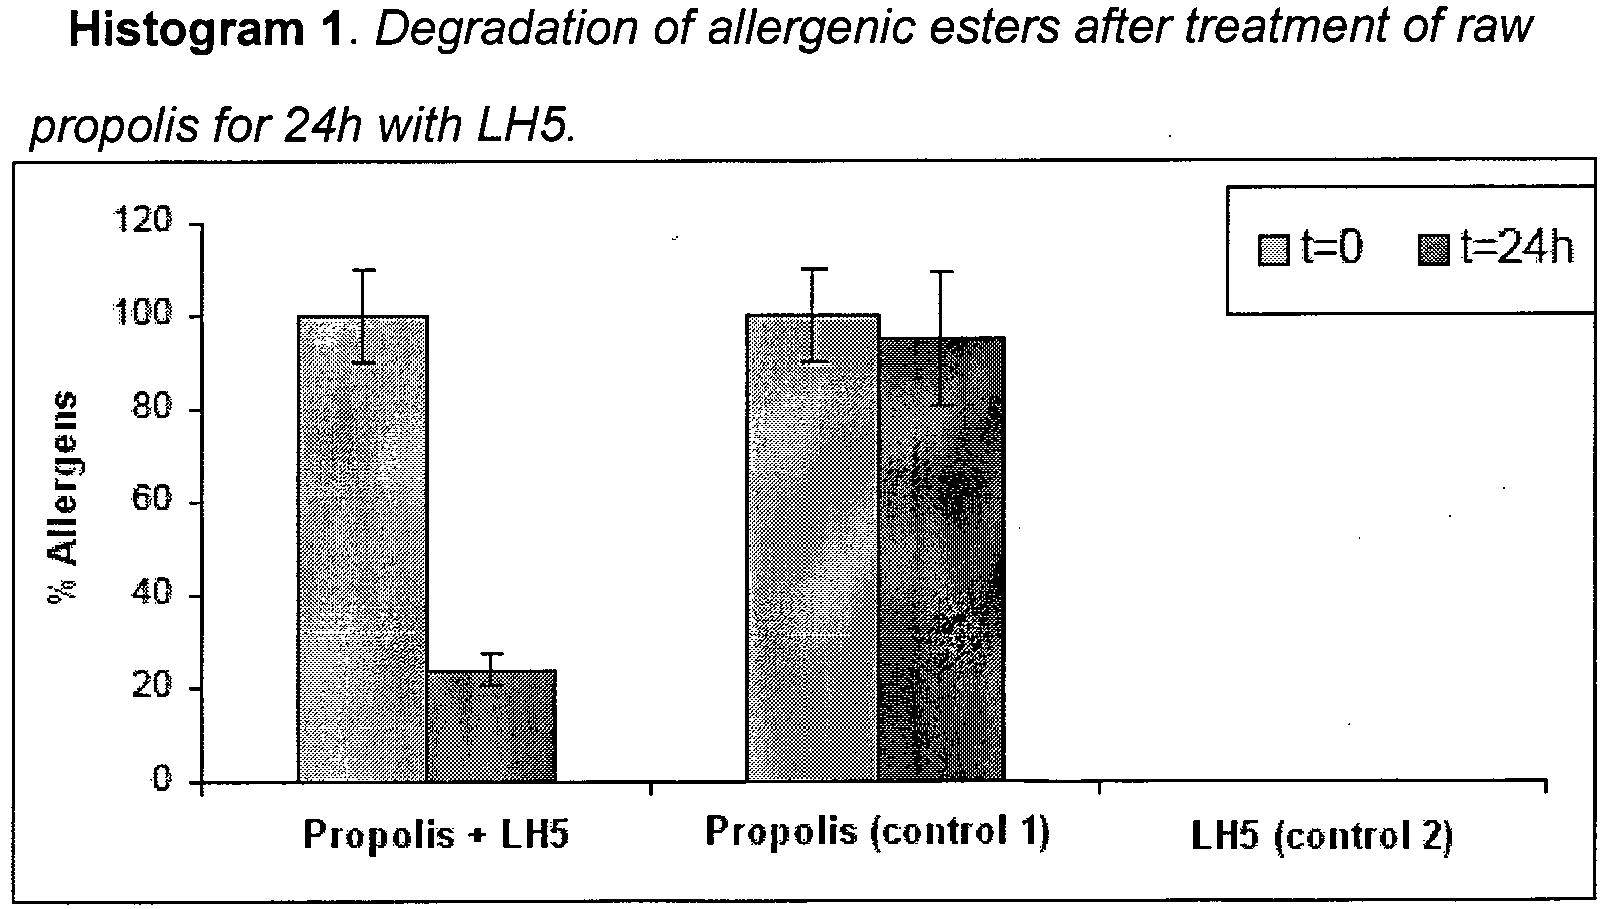 EP2547347B1 - Process for obtaining non-allergic propolis - Google